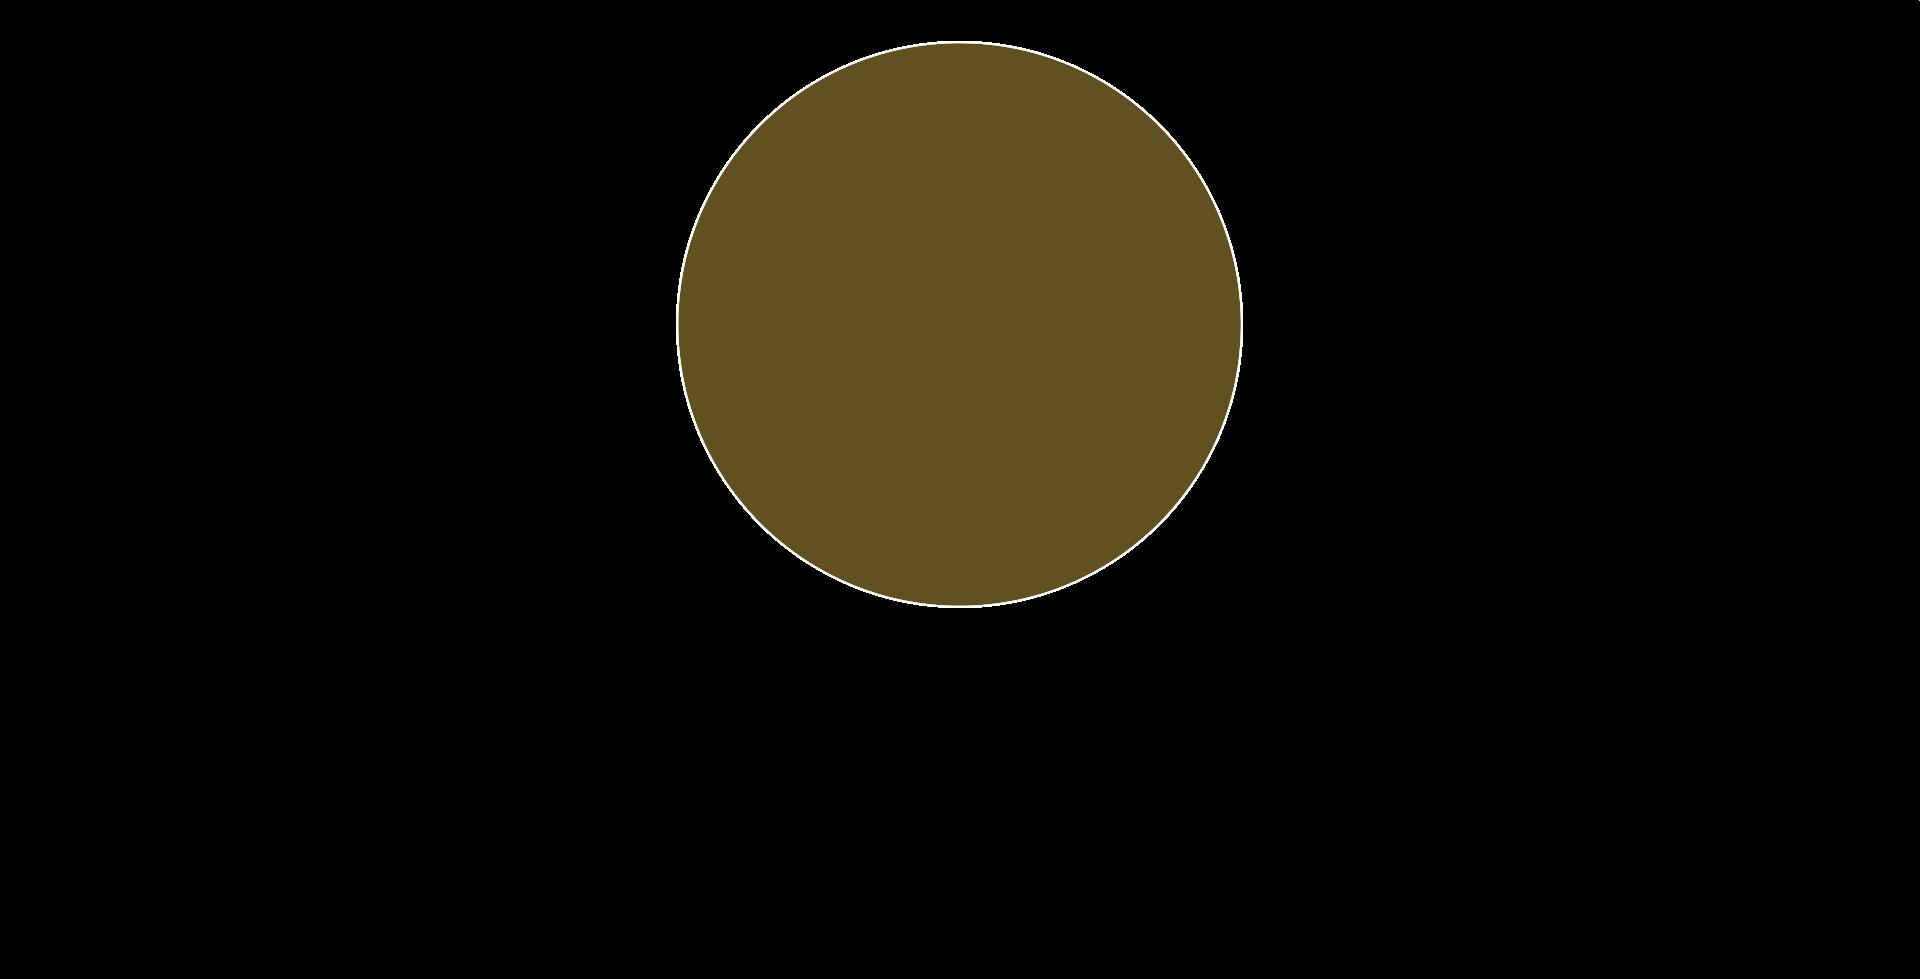 circle-2